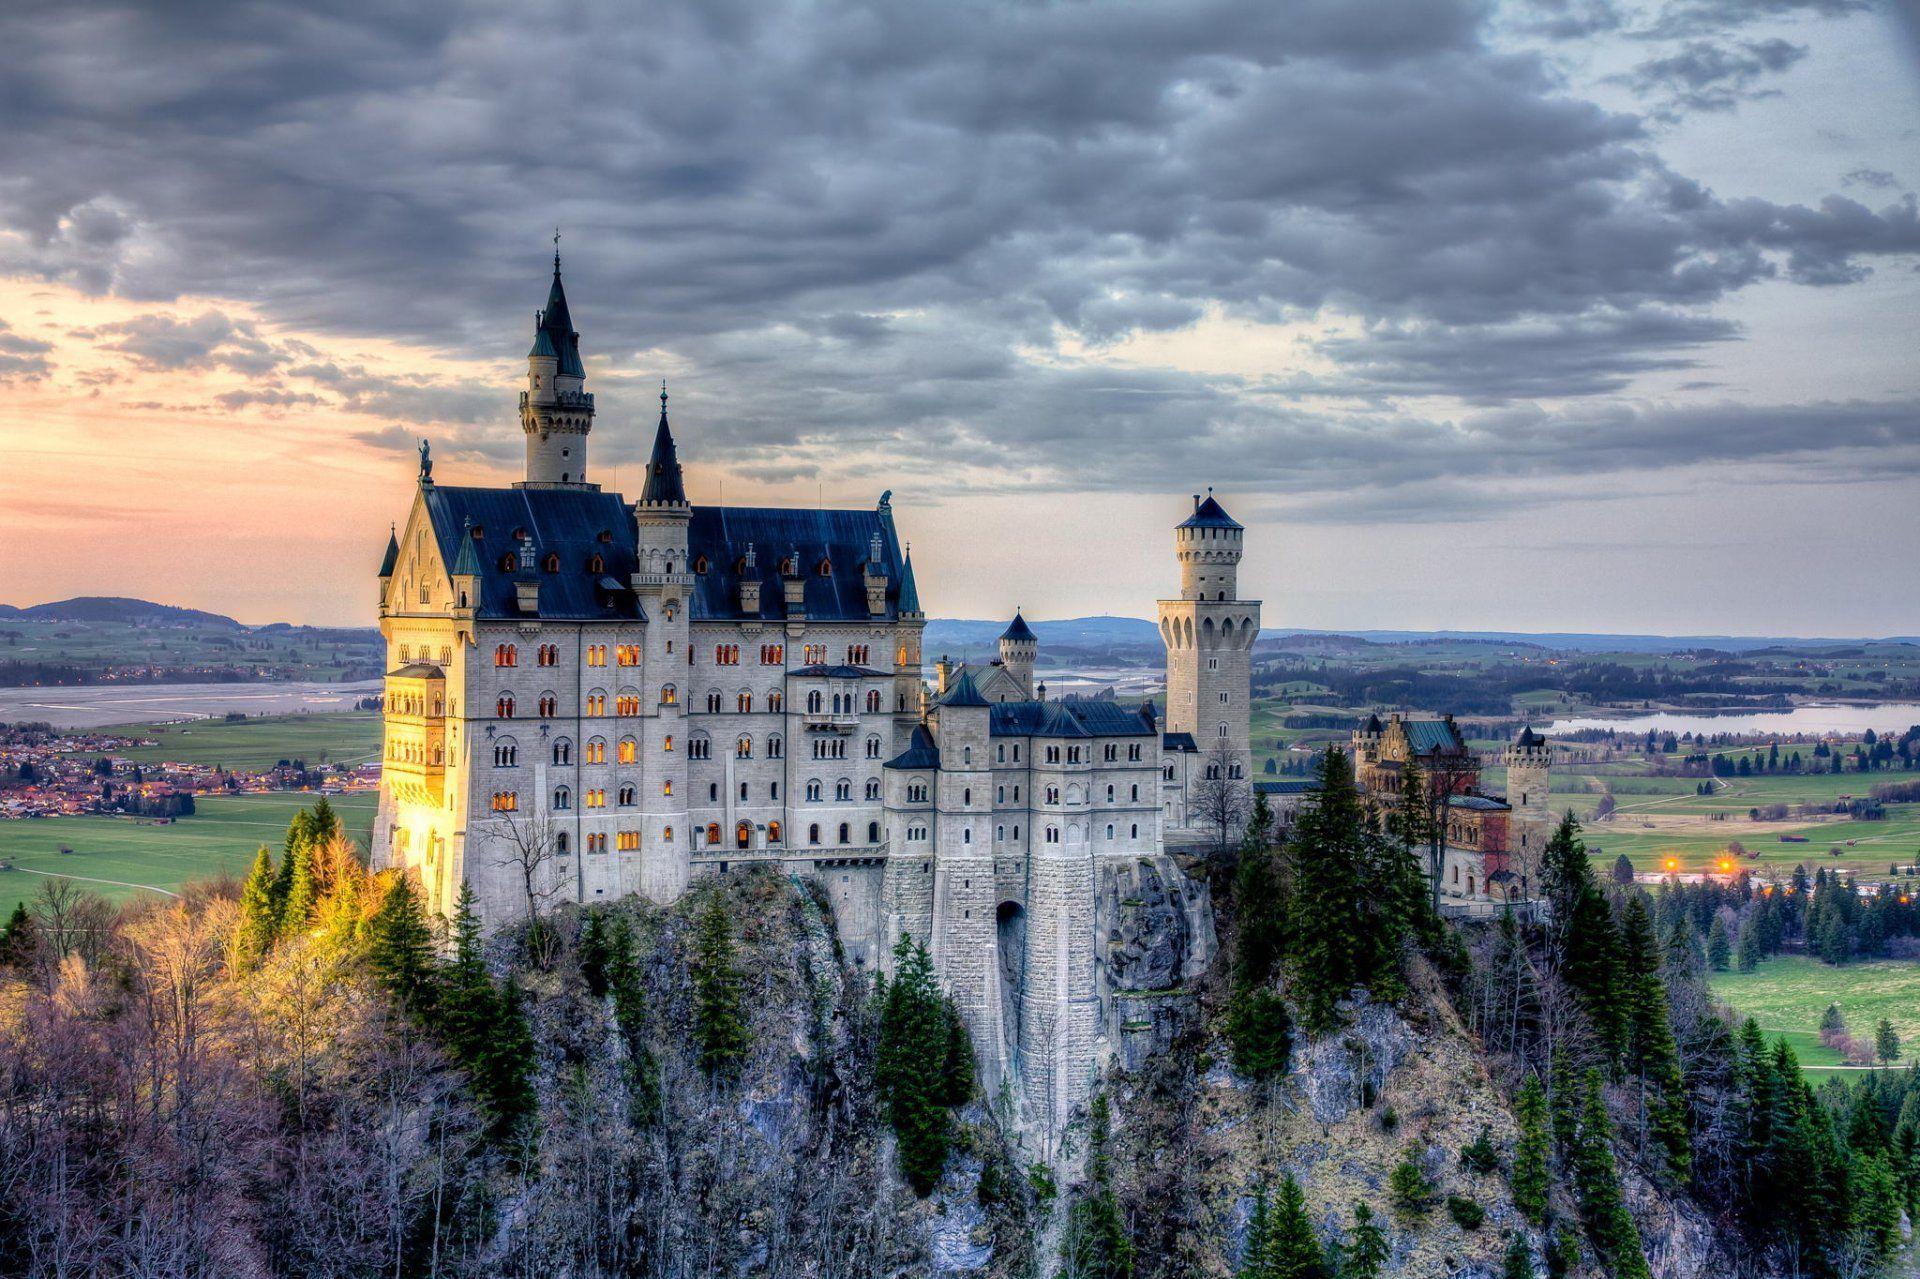 Home Of King Ludwig Neuschwanstein Castle Bavaria Germany Bayern Munich Hd Wallpaper Neuschwanstein Castle Castle Bavaria Germany Castles